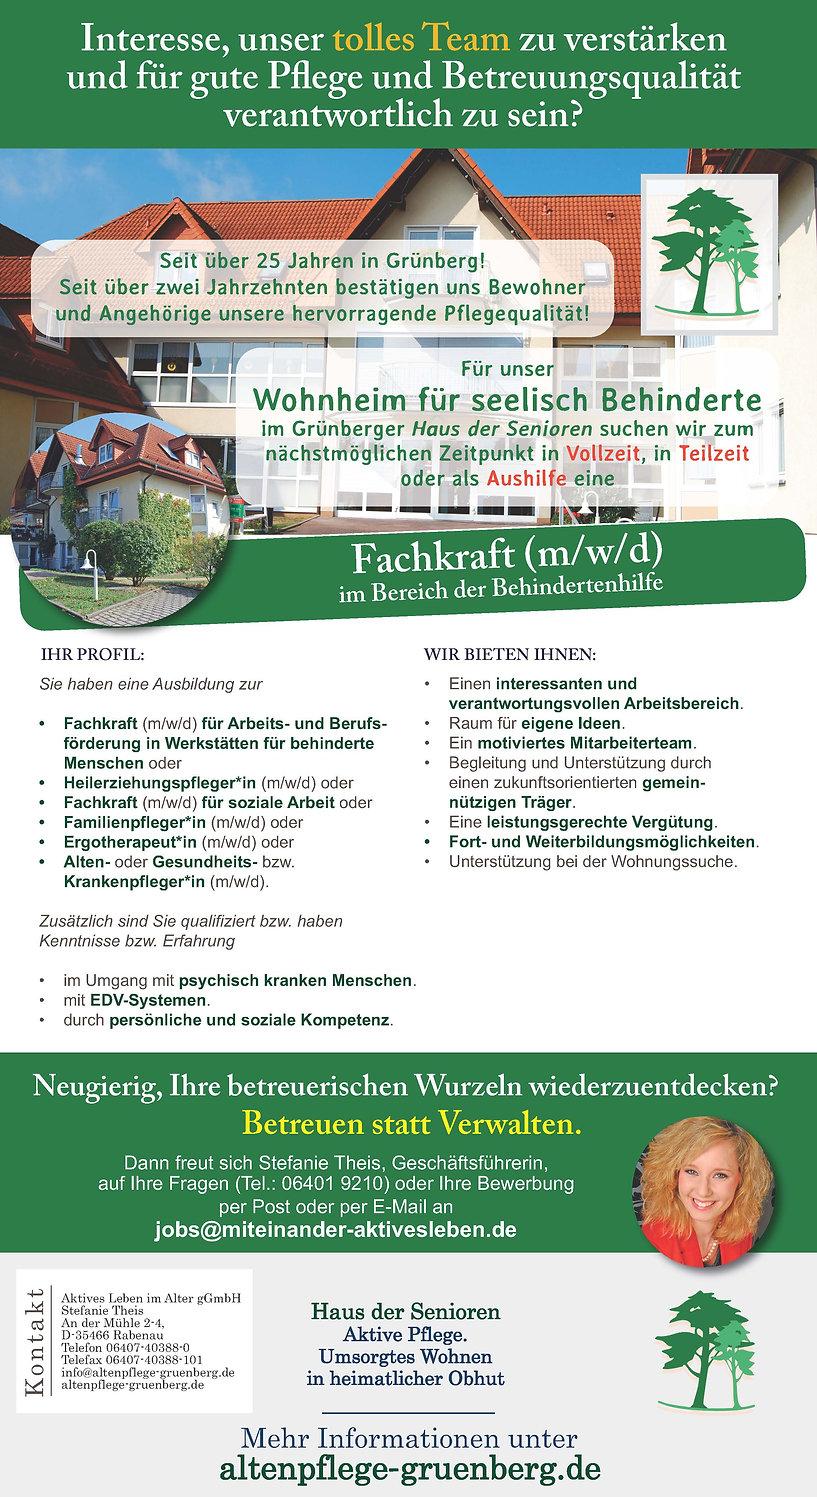 HdS_WohnheimfsB_102021.jpg